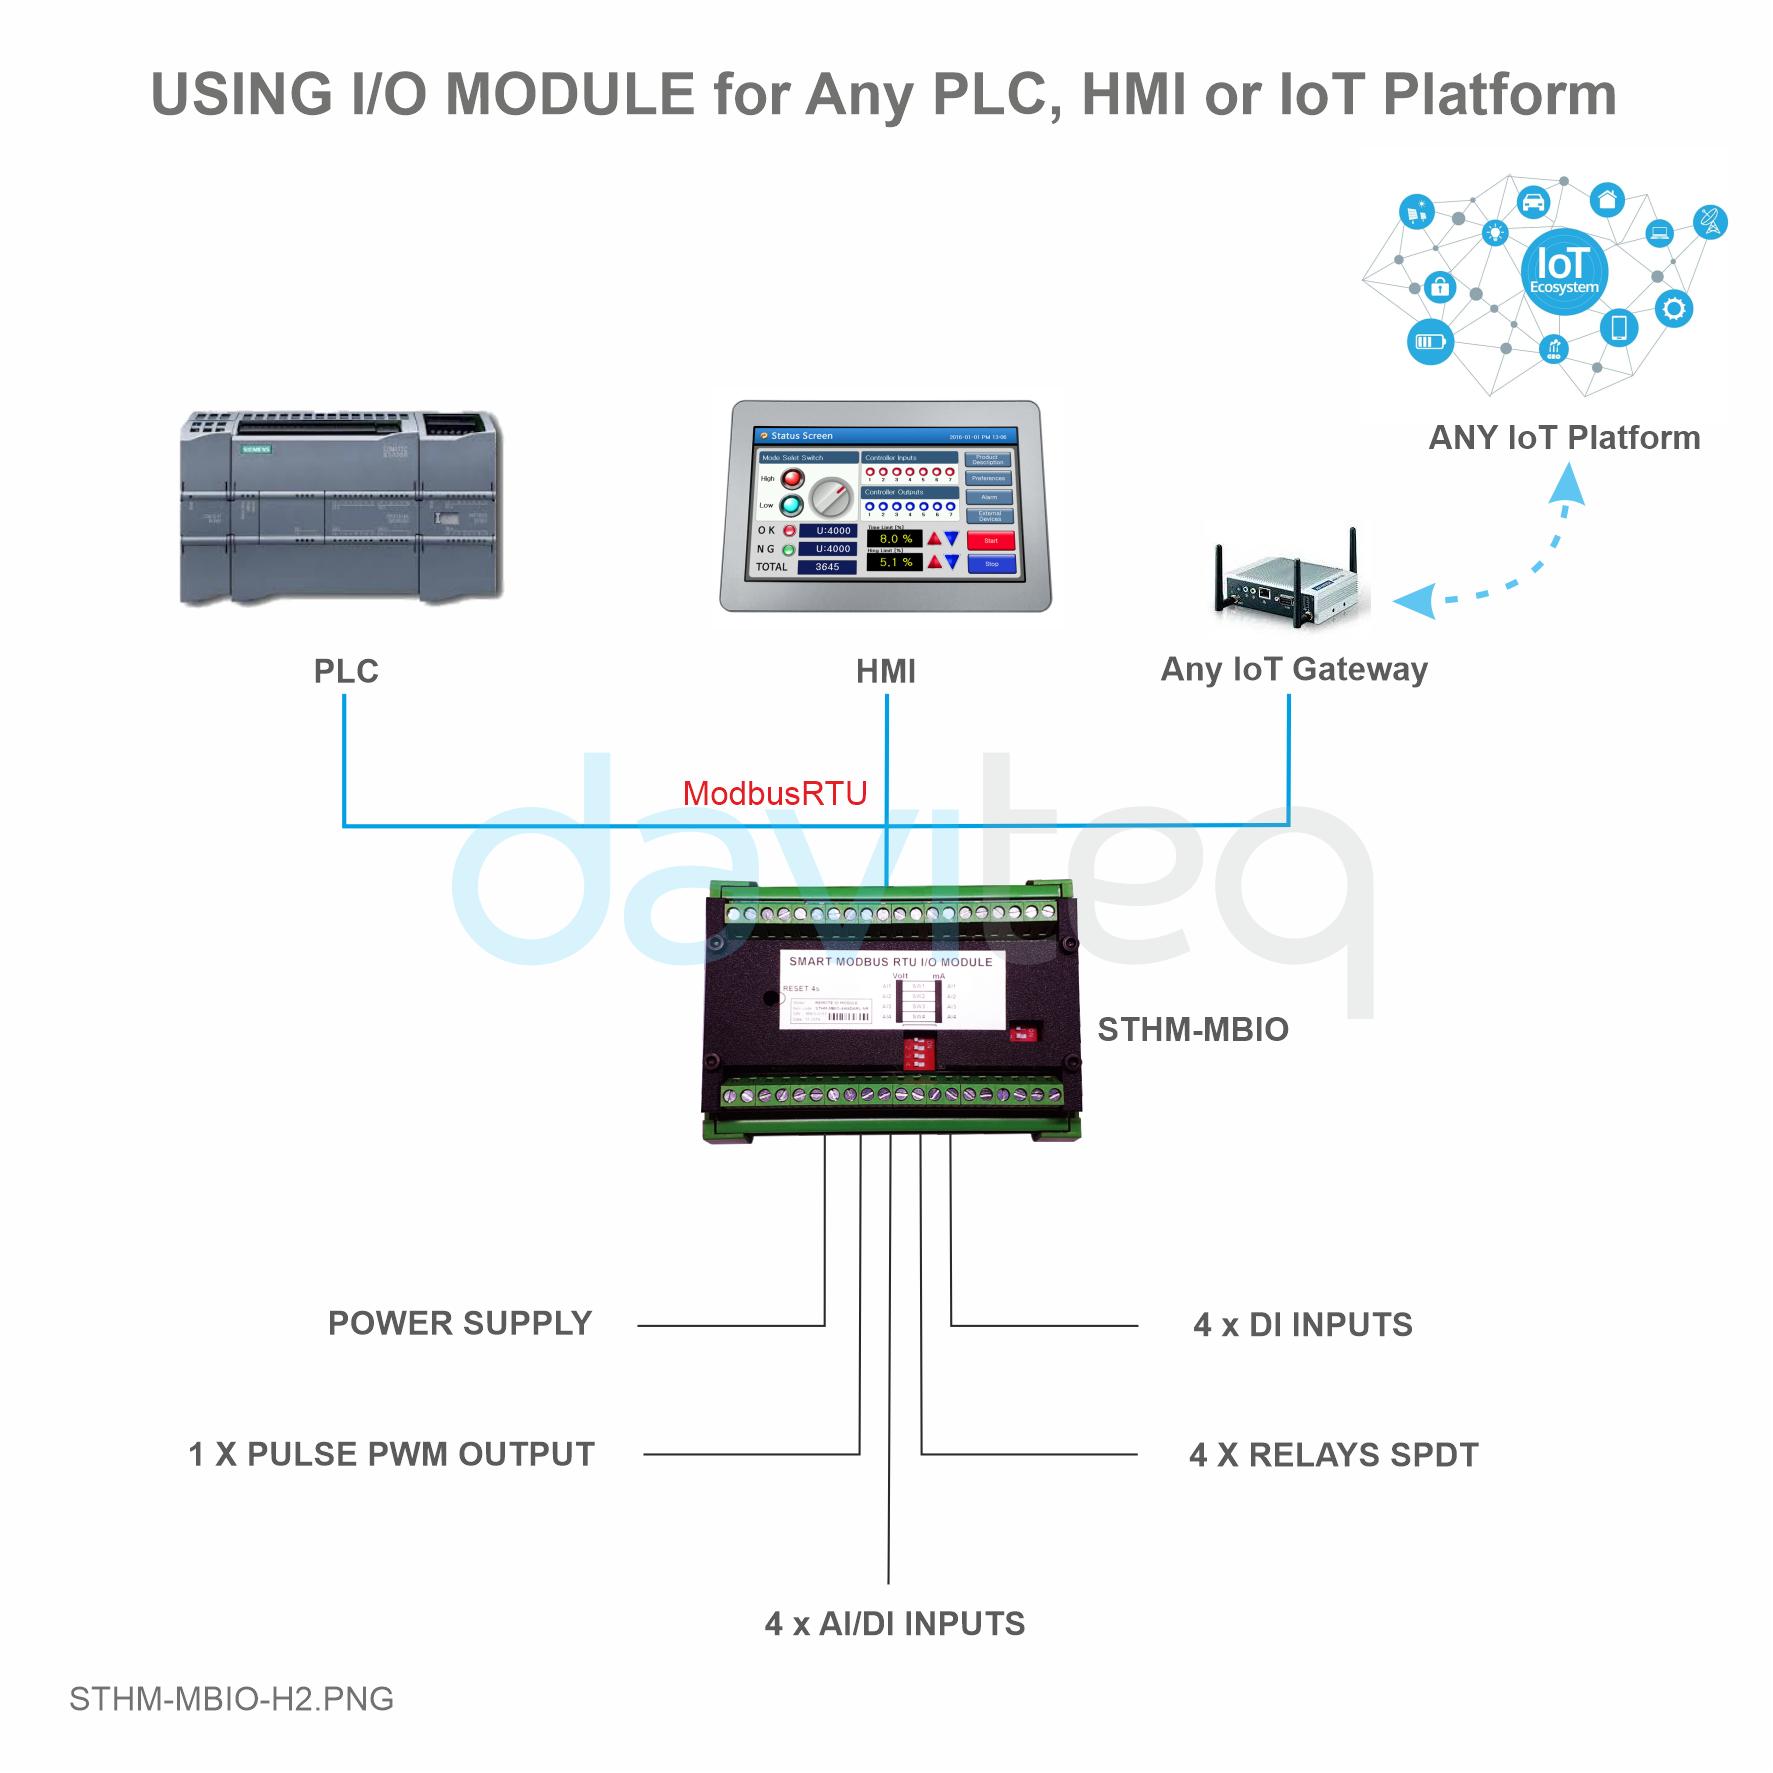 STHM-MBIO-H2.png